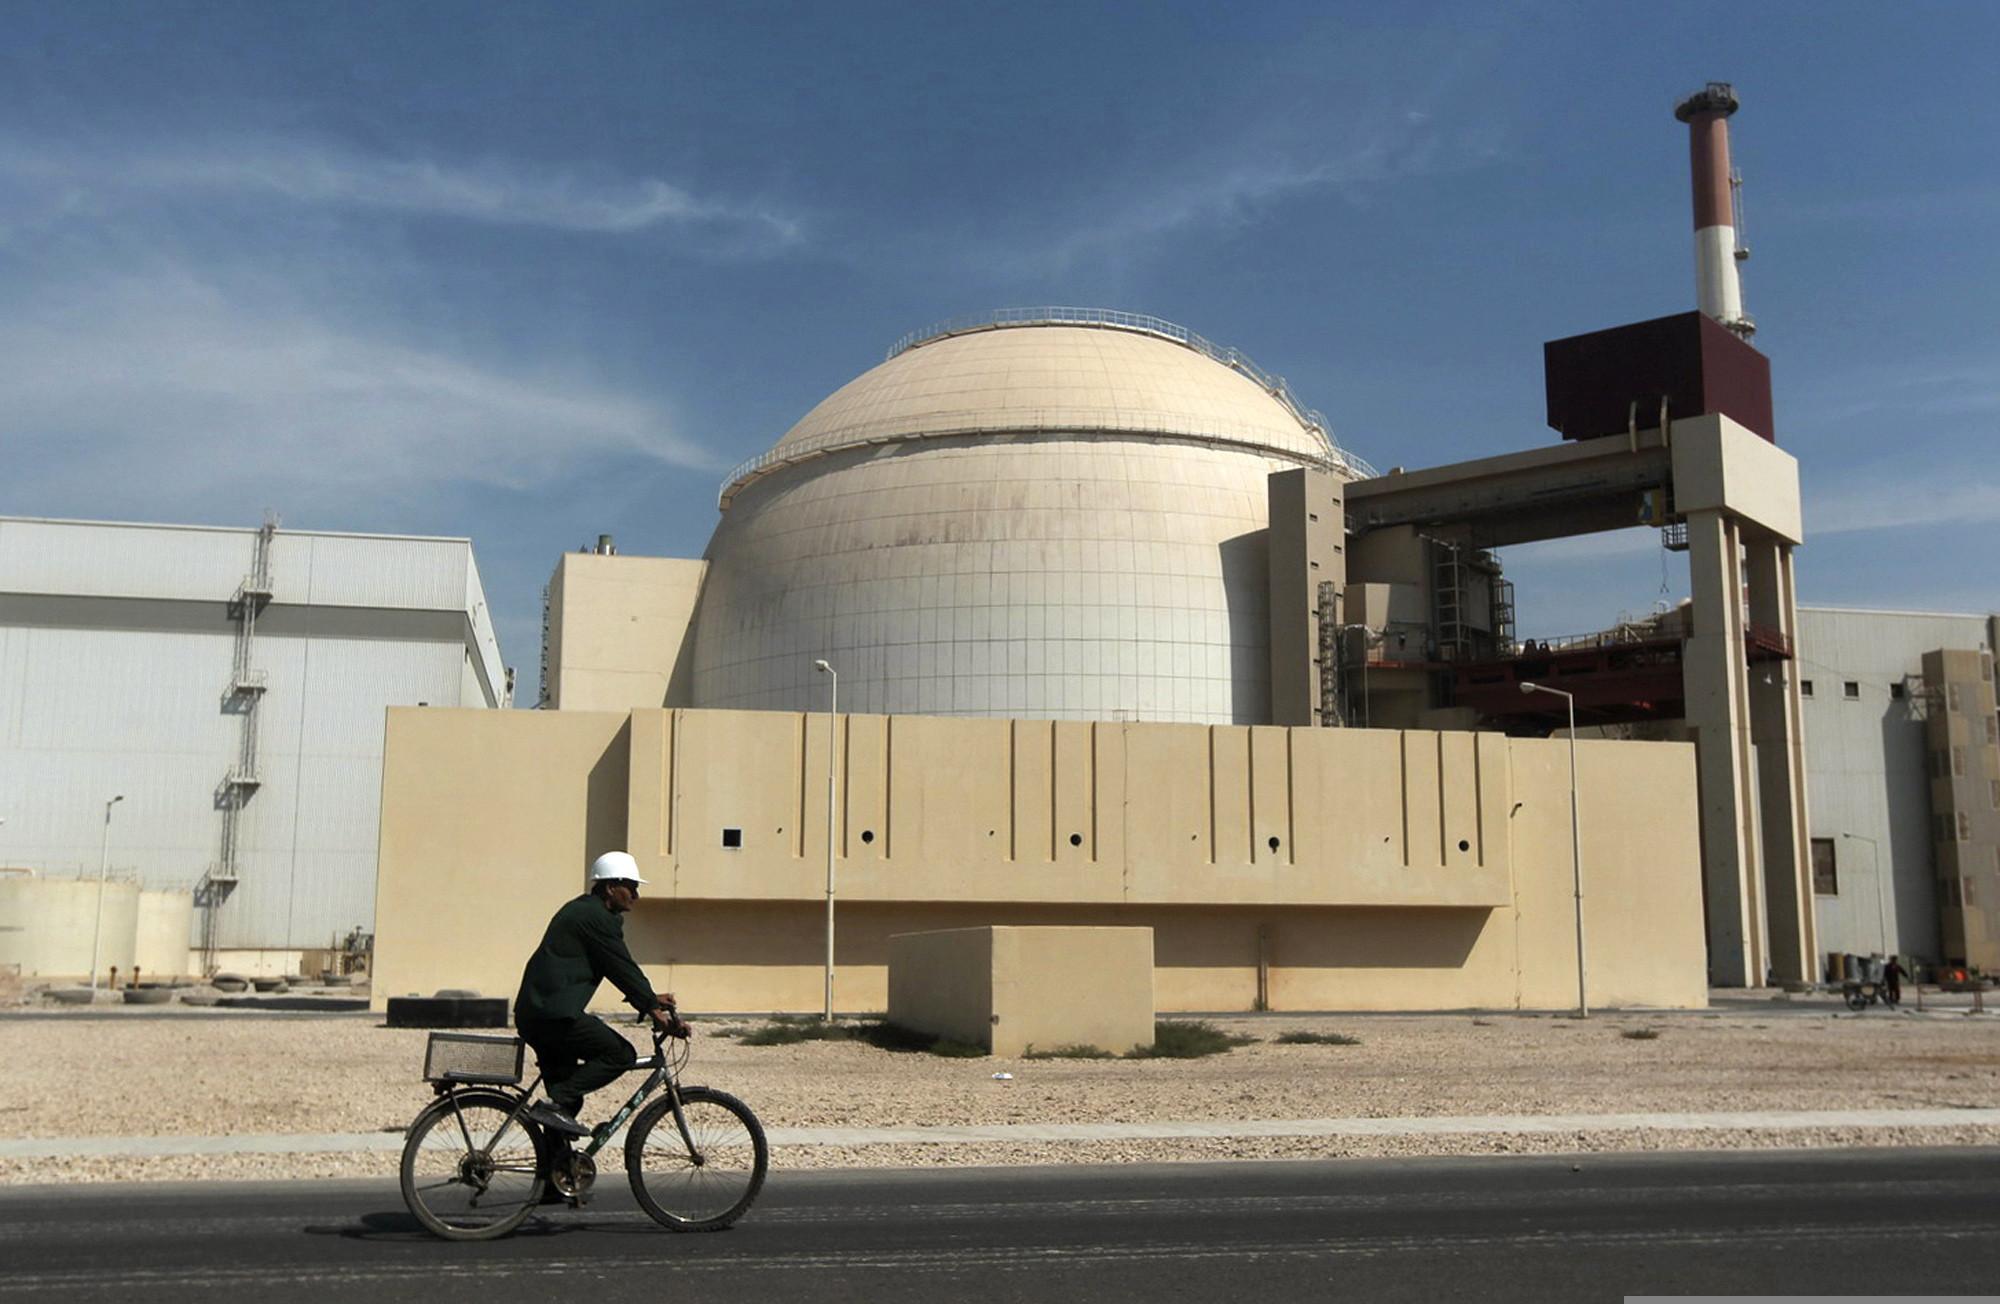 Magnitude 4.9 earthquake hits near Iranian nuclear power plant